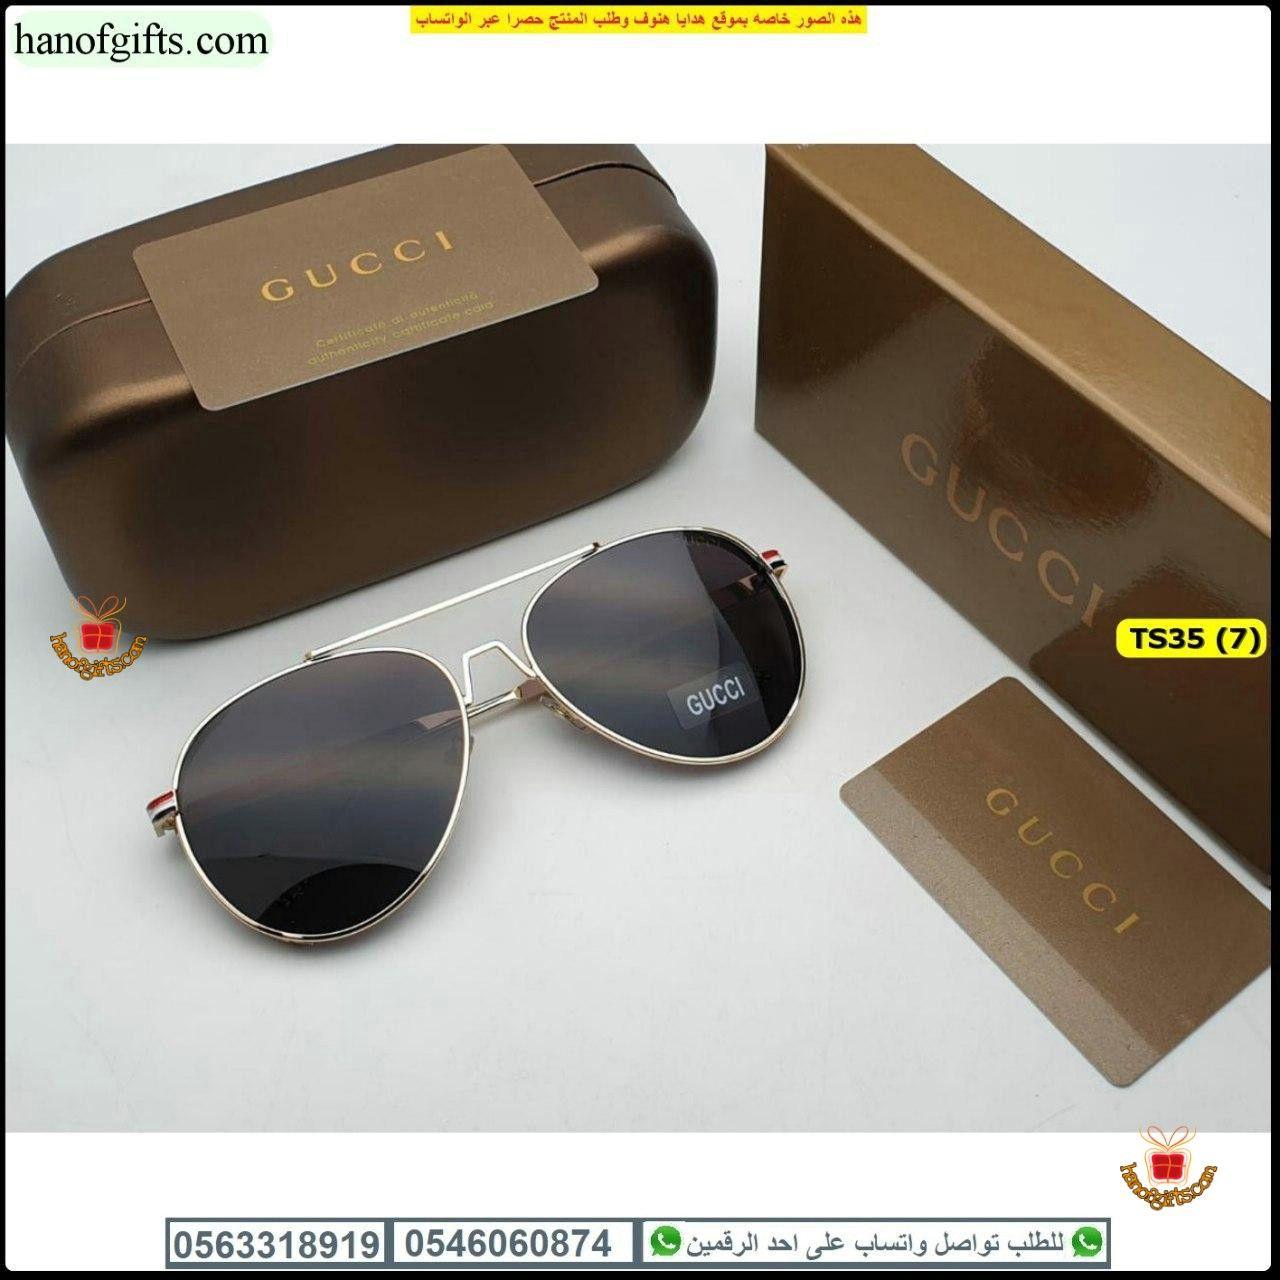 نظارات رجالي قوتشي Gucci مع الملحقات كيس و منديل و علبة الماركه هدايا هنوف Square Sunglass Sunglasses Glasses